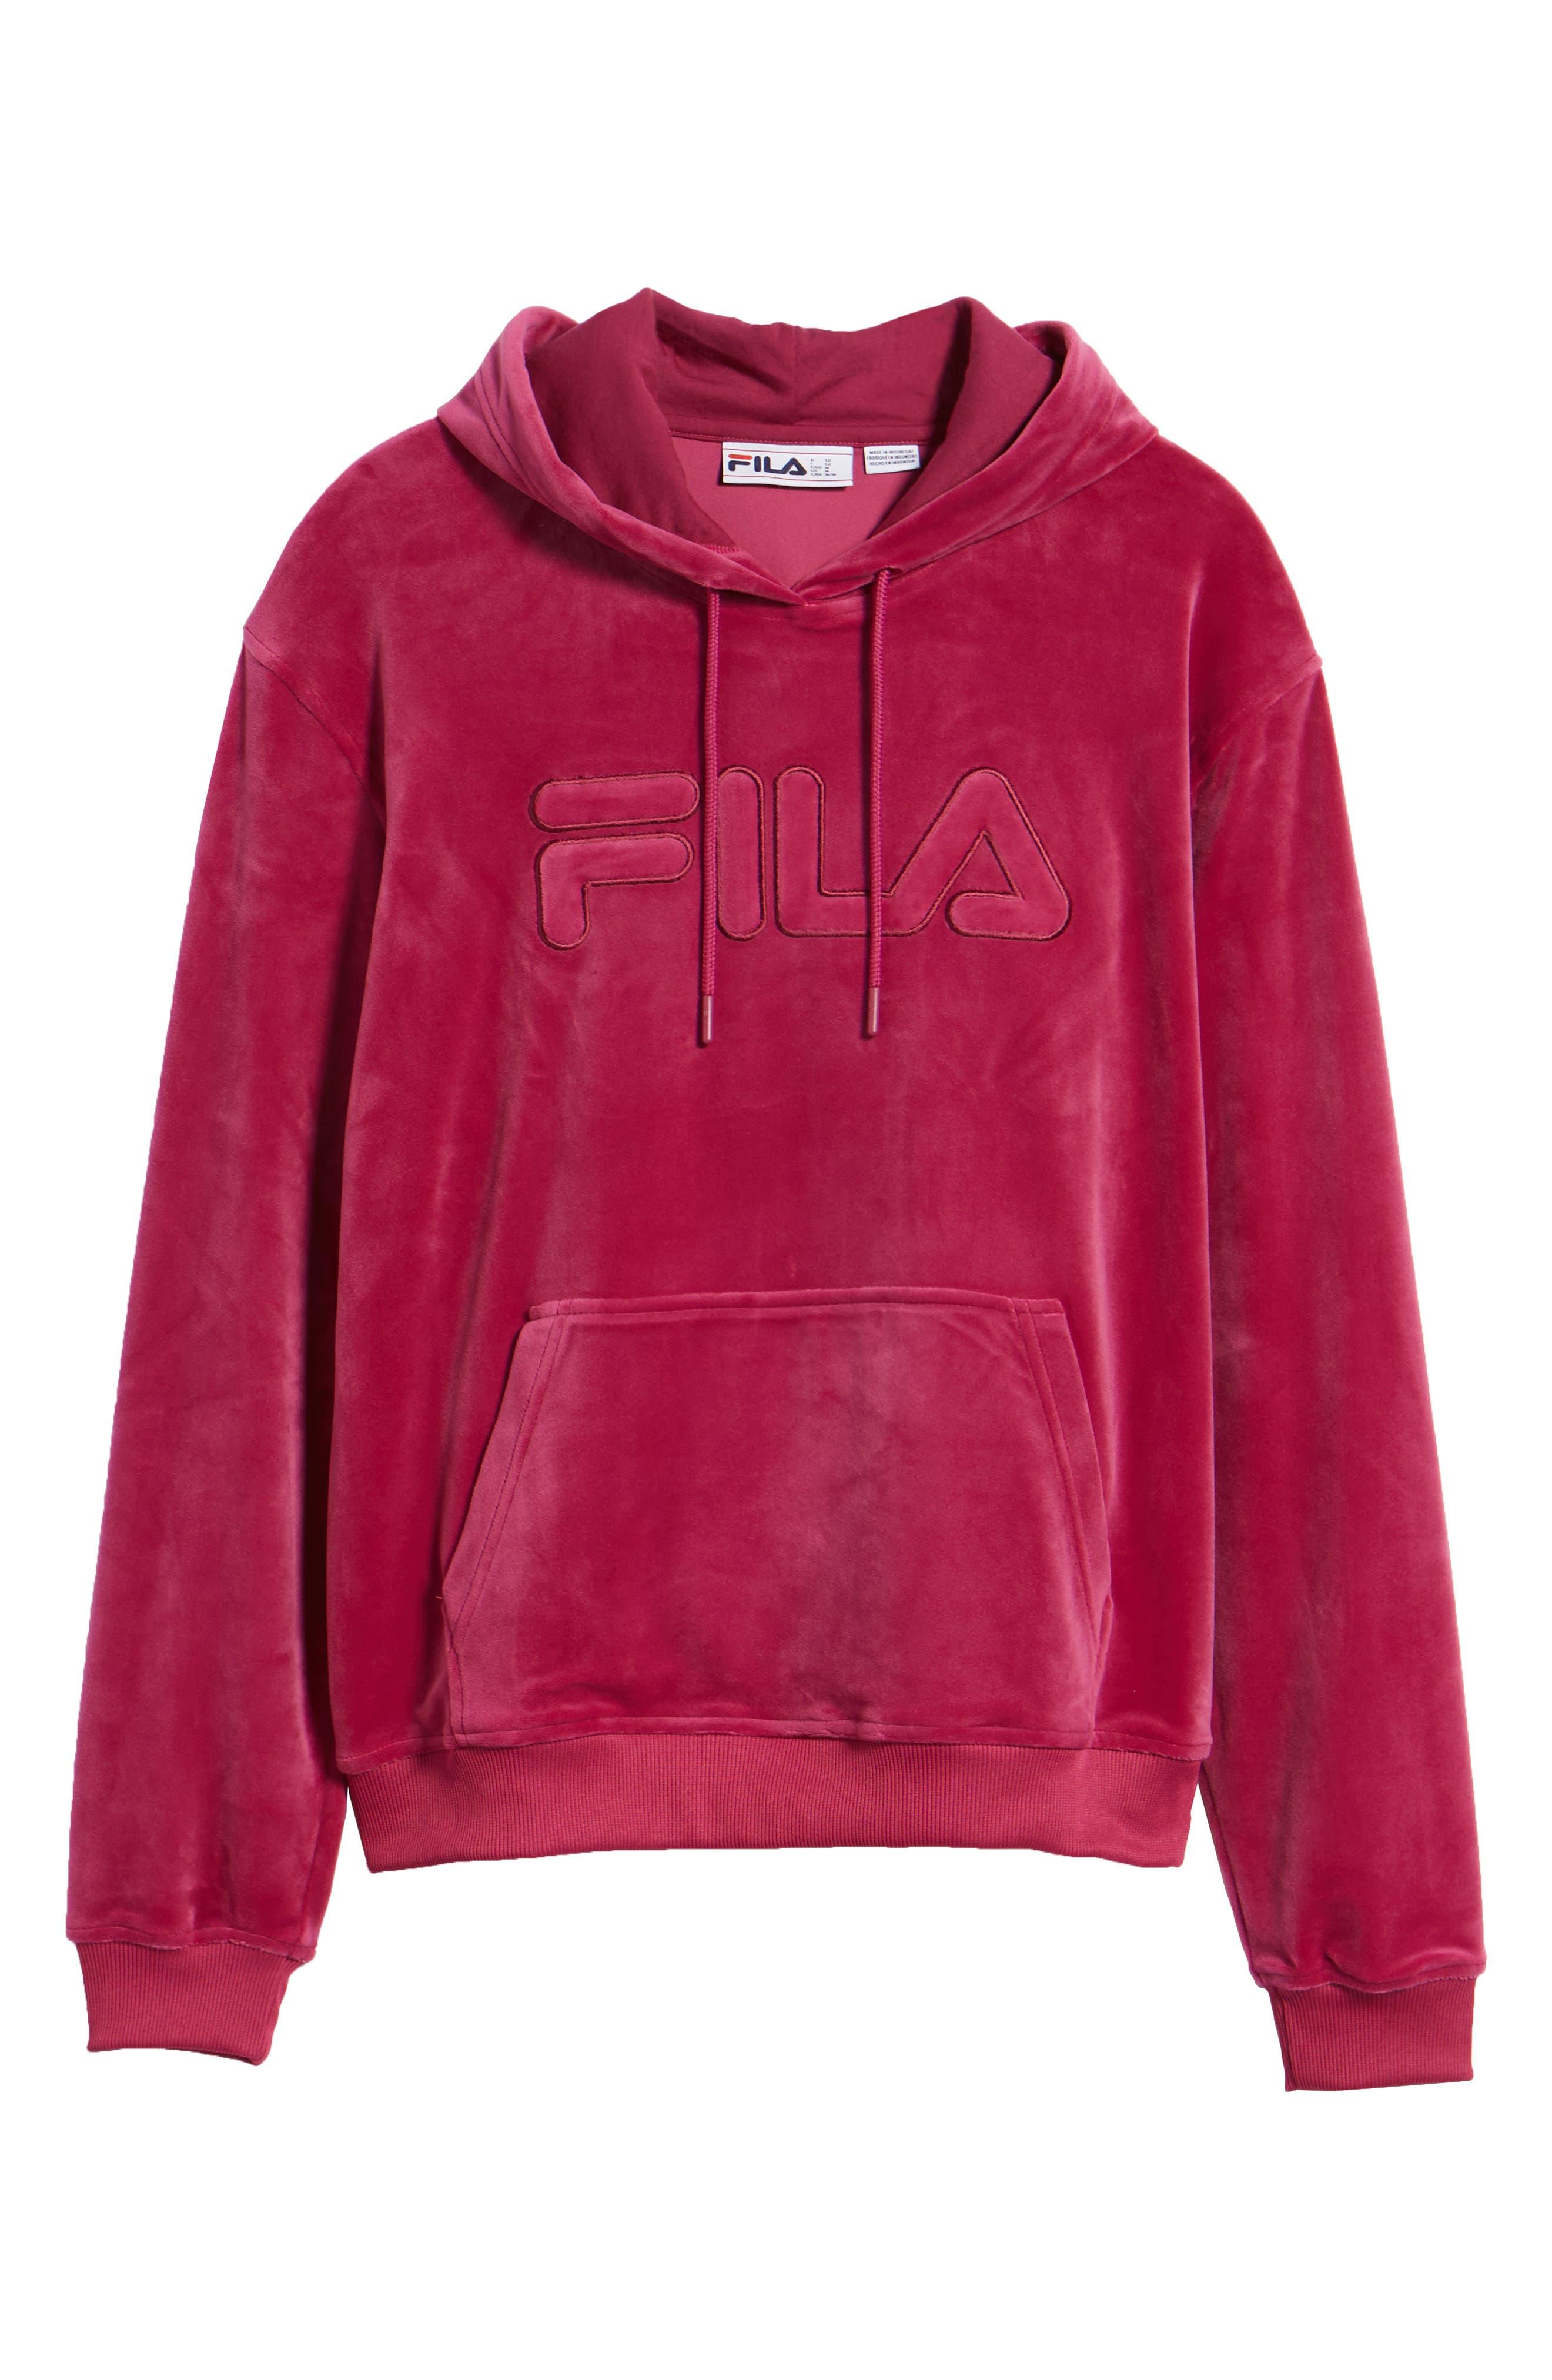 Asher Velour Hoodie Sweatshirt,                             Alternate thumbnail 6, color,                             Rasberry Radiance